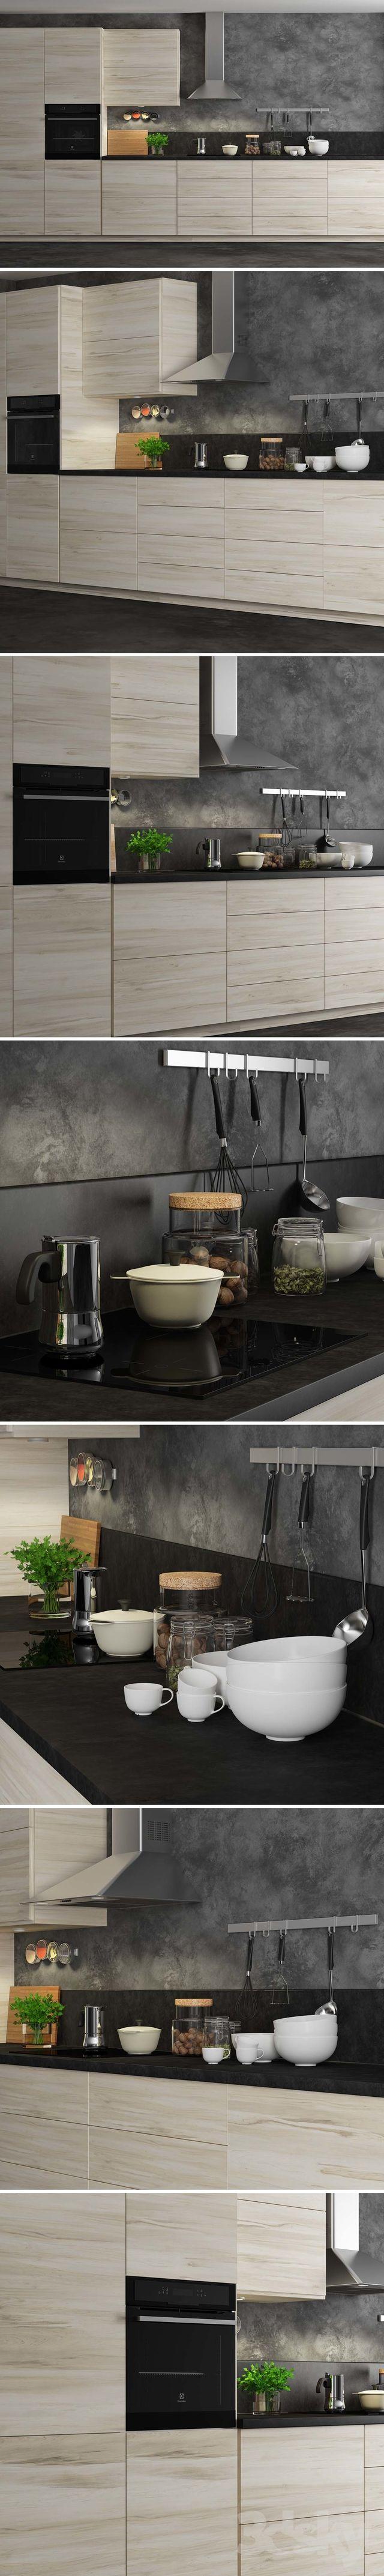 3d models: Kitchen - Kitchen Ikea Method Askersund. | Decoración en ...